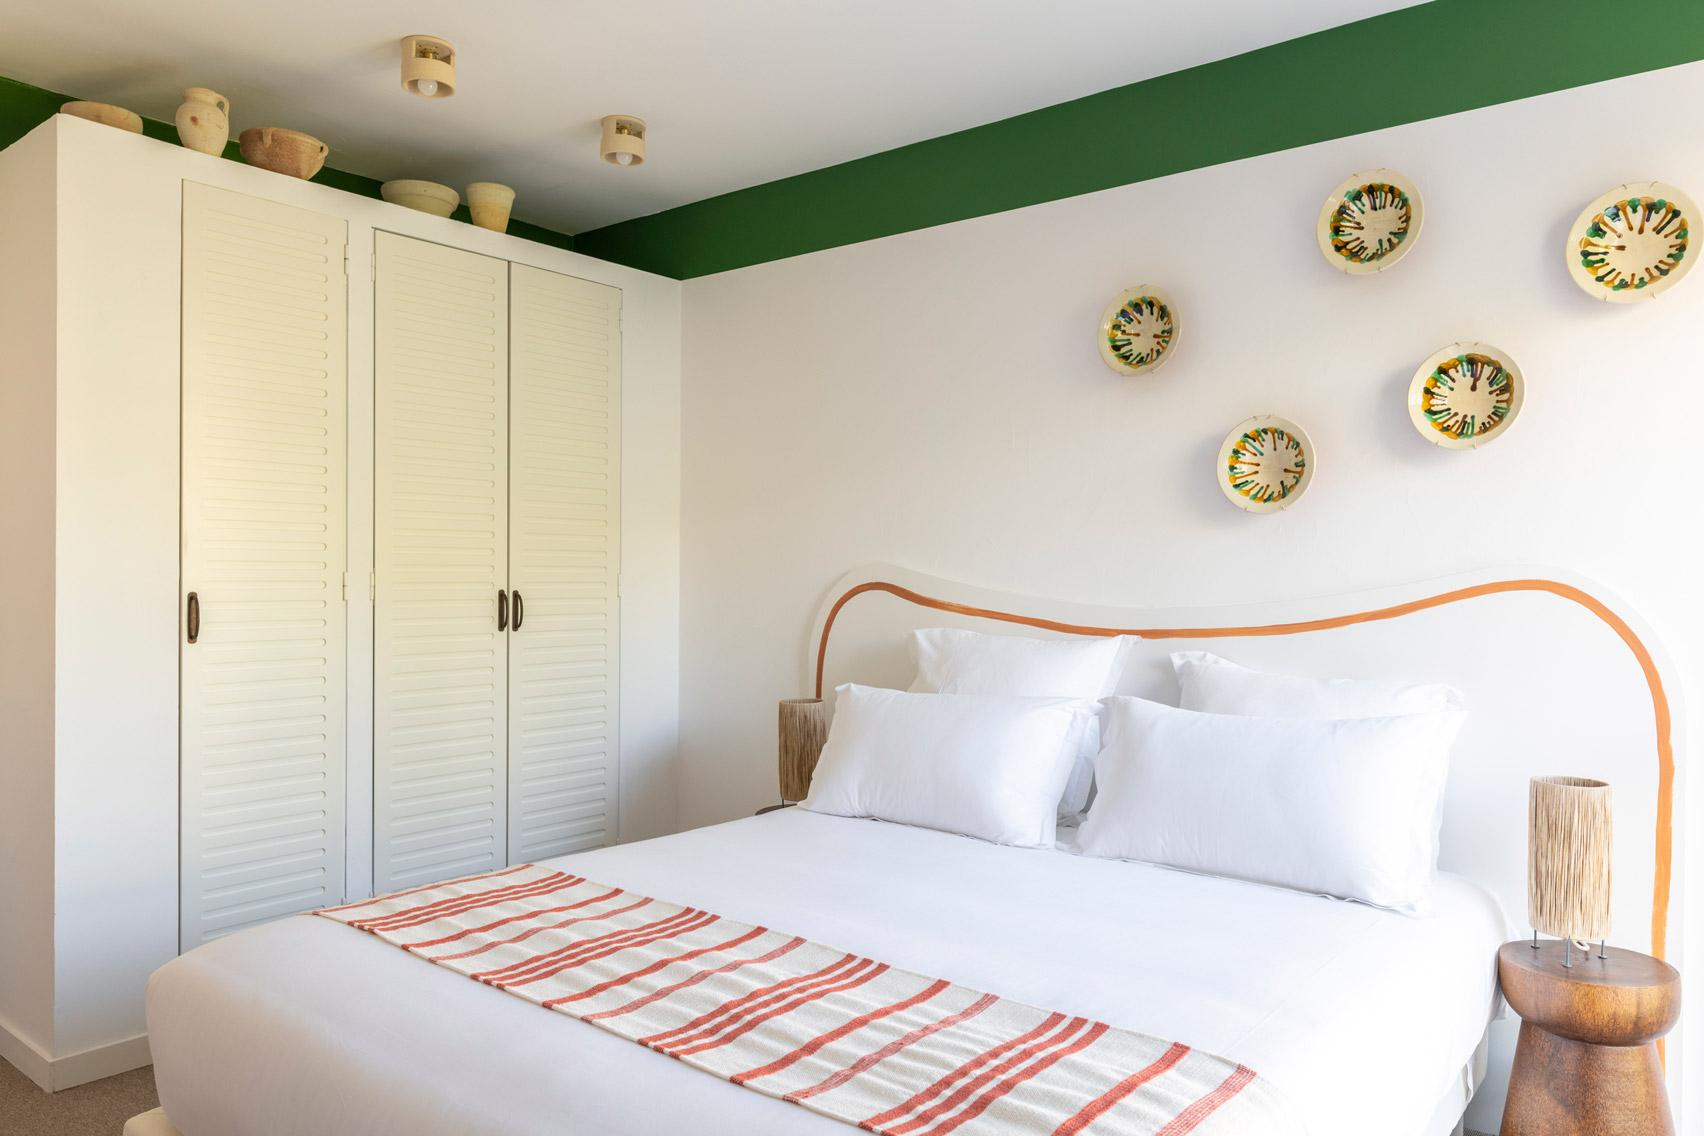 Hotel Le Sud designed by Stéphanie Lizée